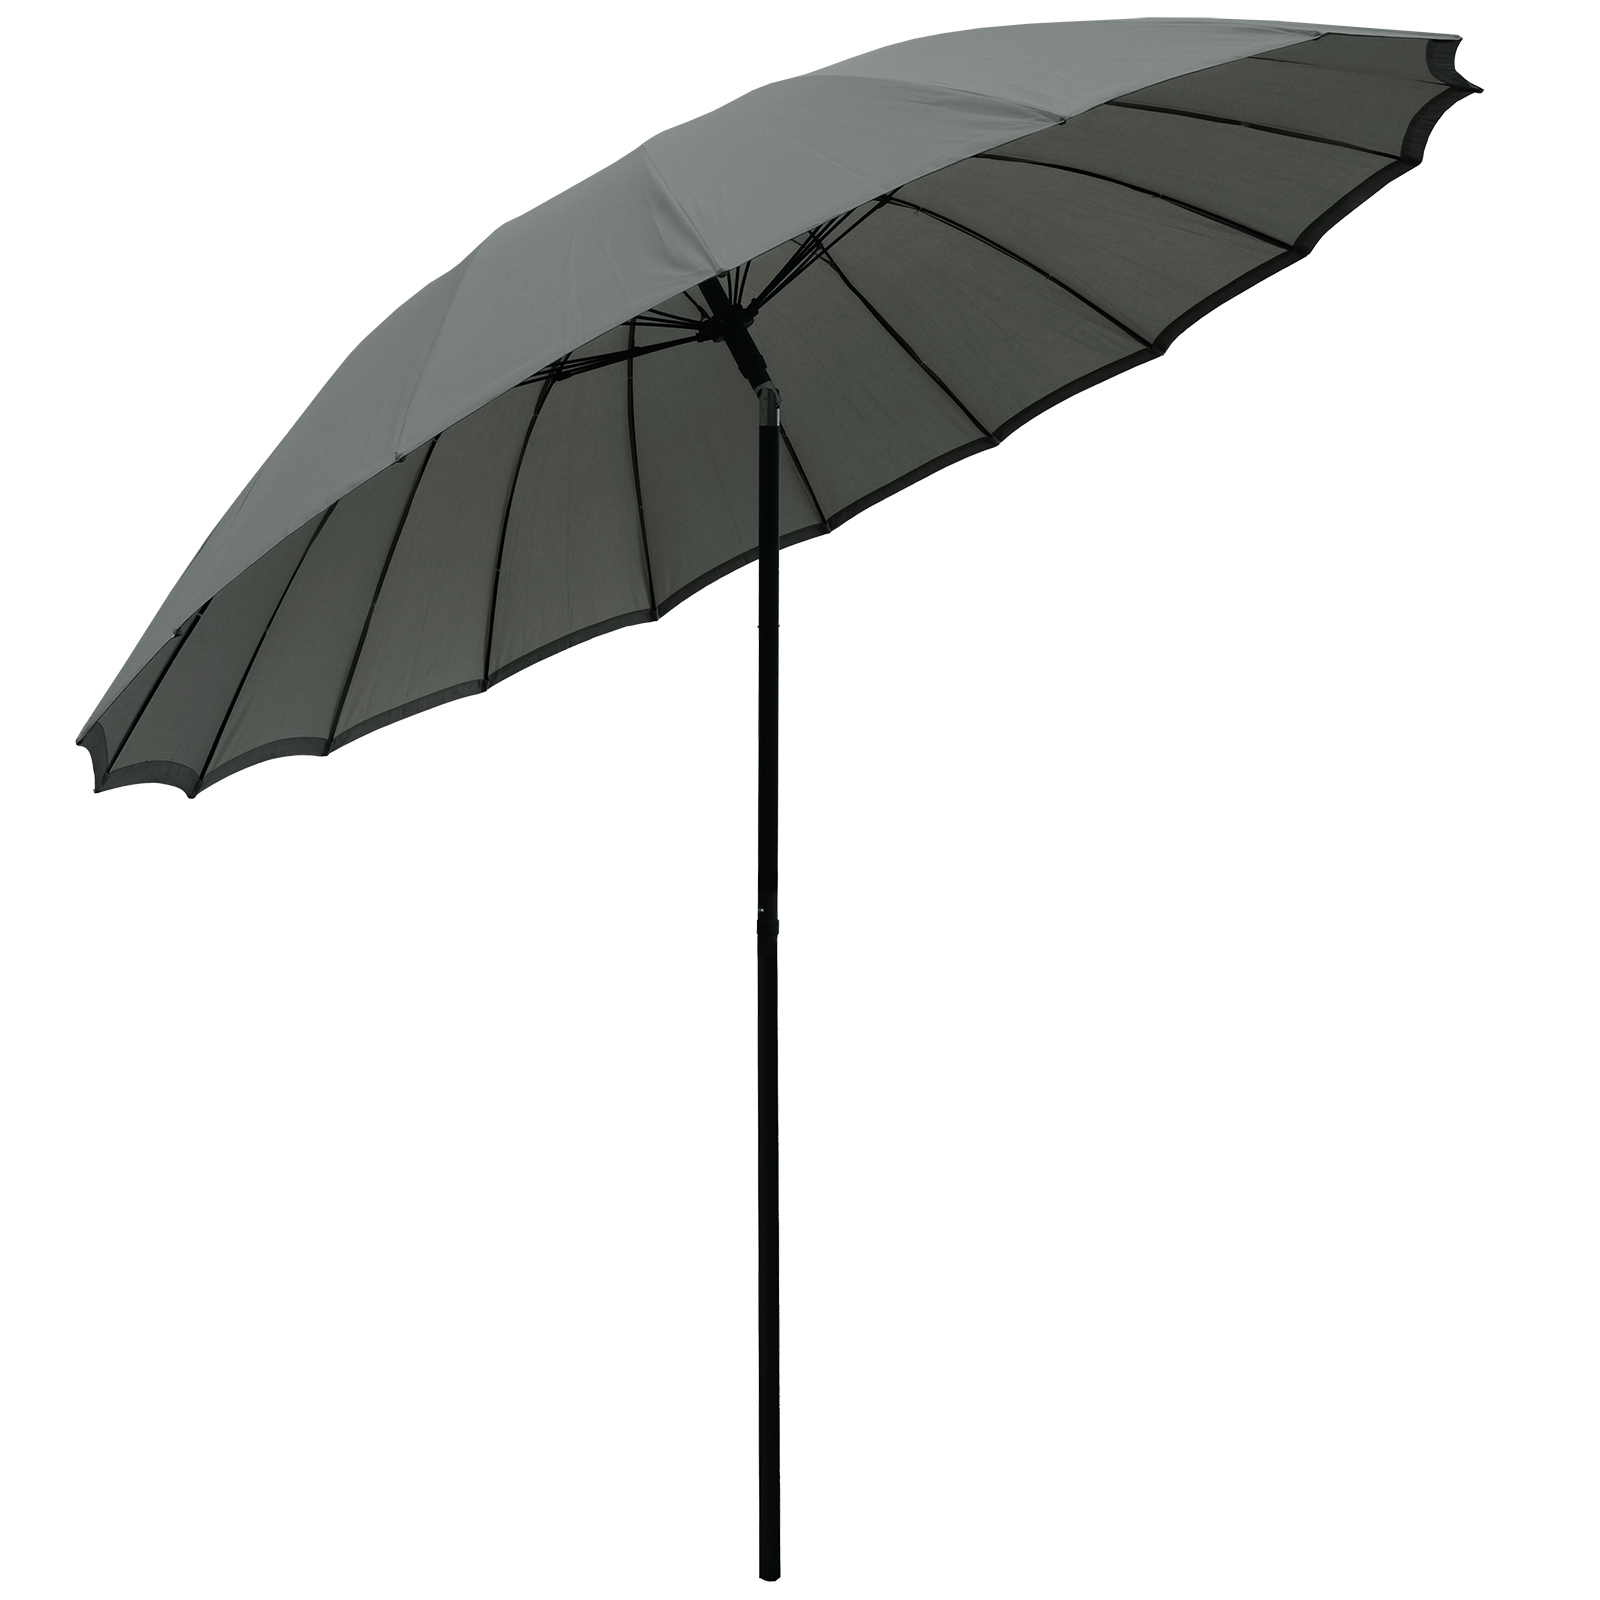 New Tilting Shanghai Parasol Umbrella Sun Shade For